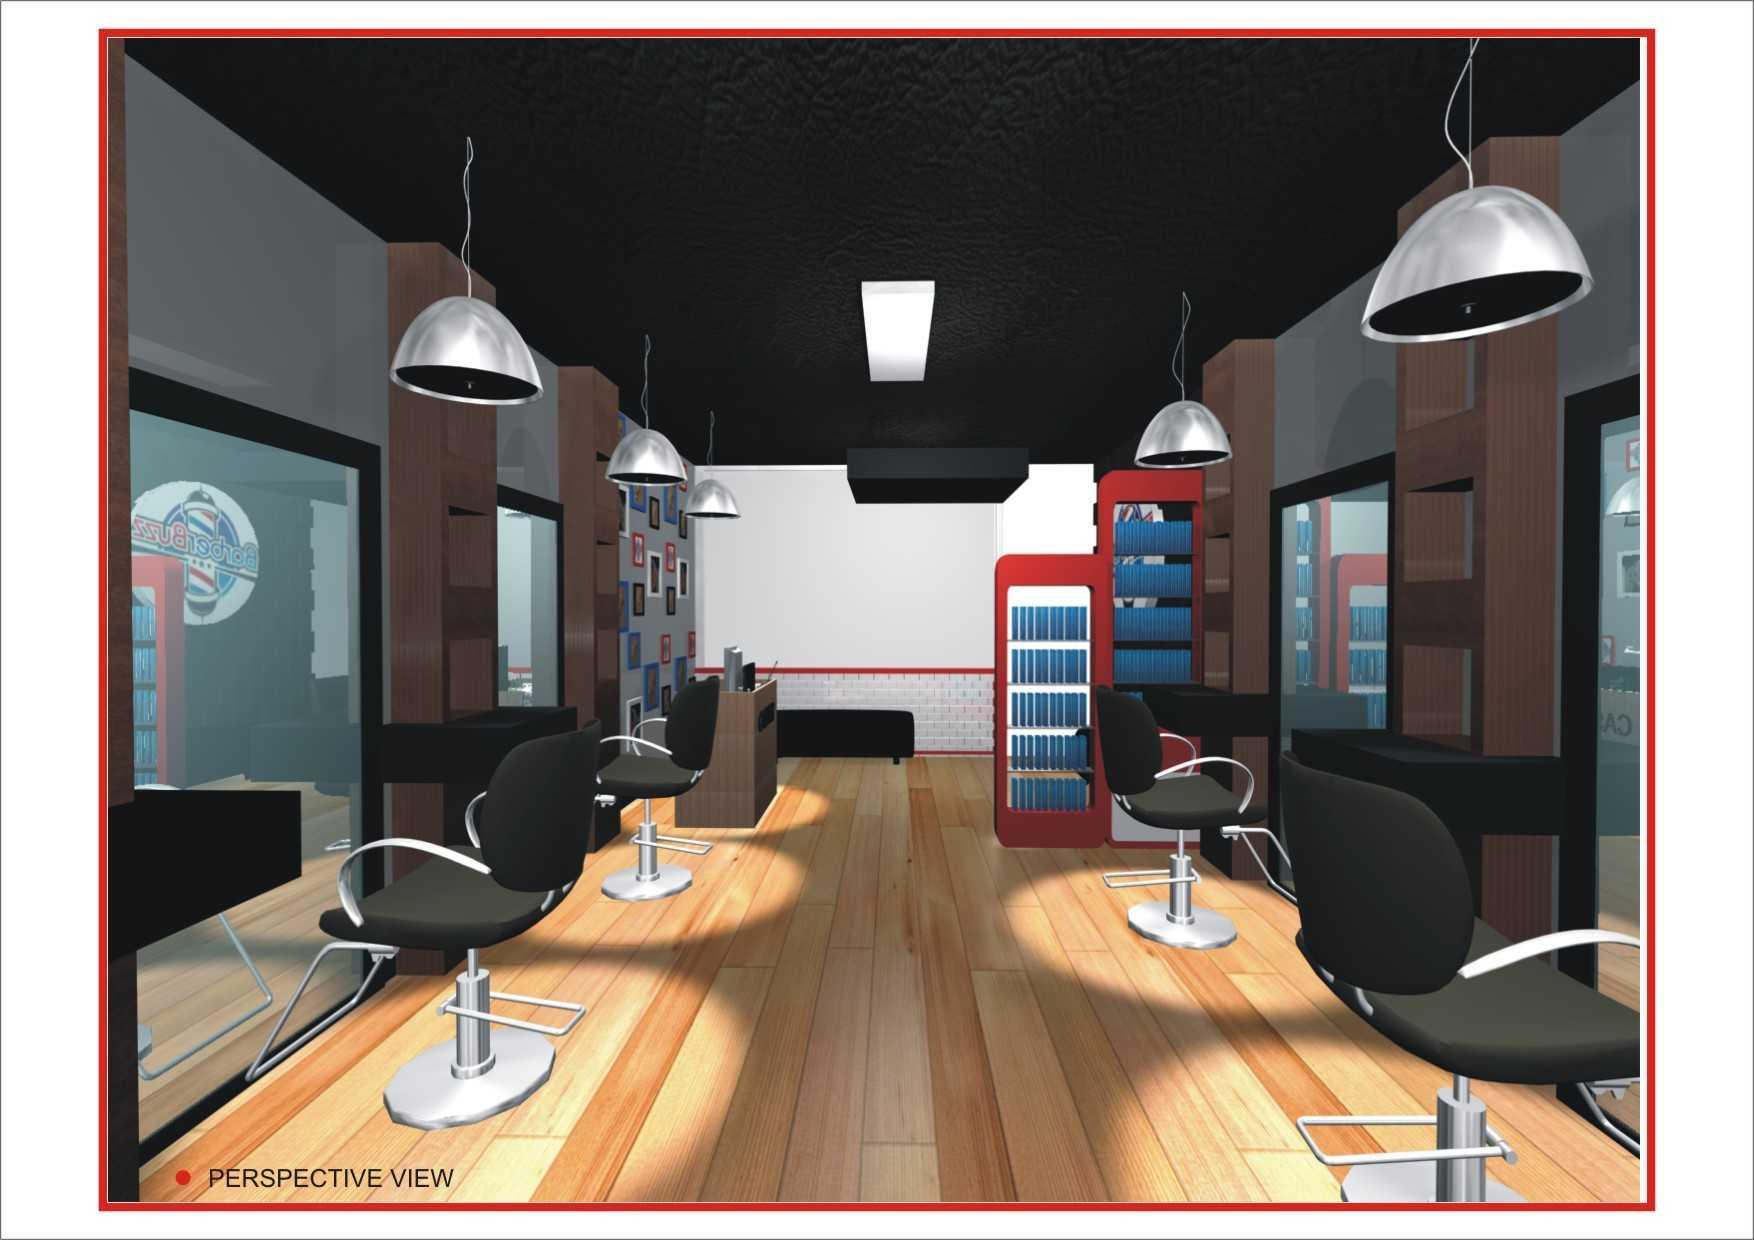 Canvas Mkc Barberbuzz - Barbershop Tangerang Tangerang Perspective View   21136